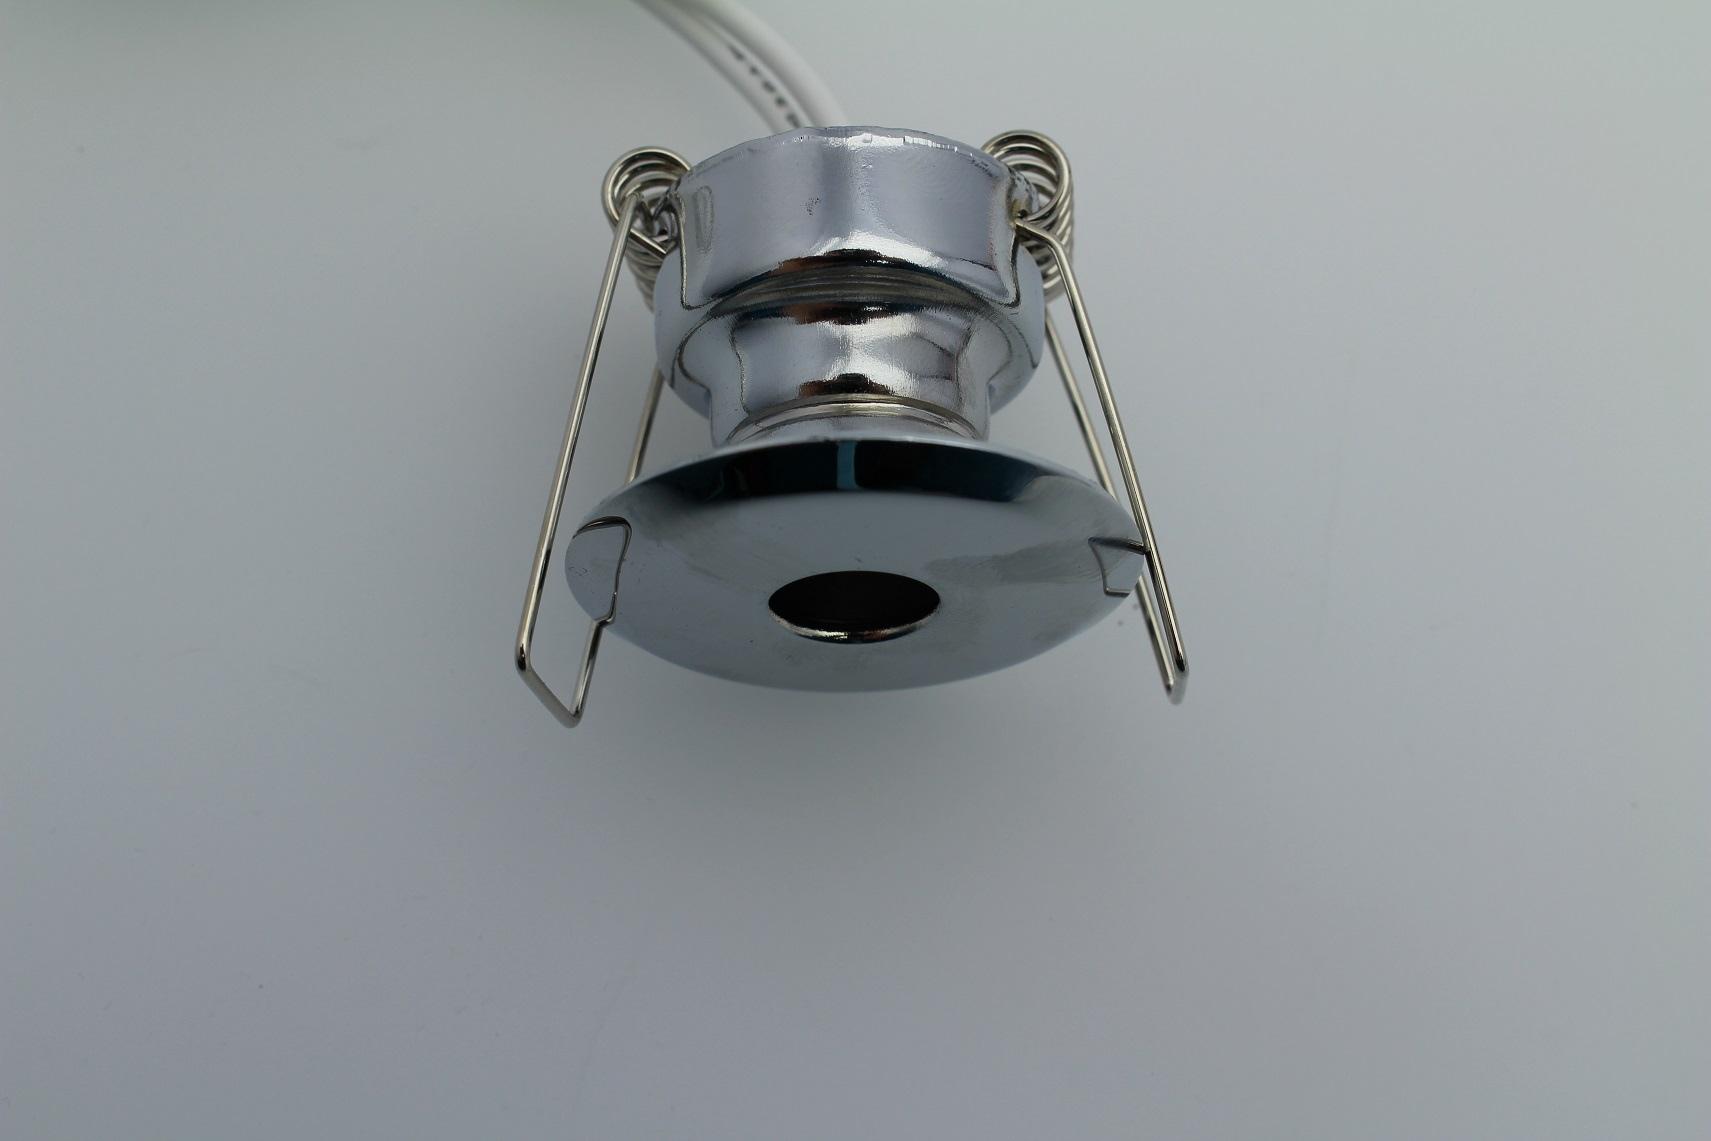 Lampenlux Einbaustrahler Punas Ø 4 cm Chrom 12V 20W G4